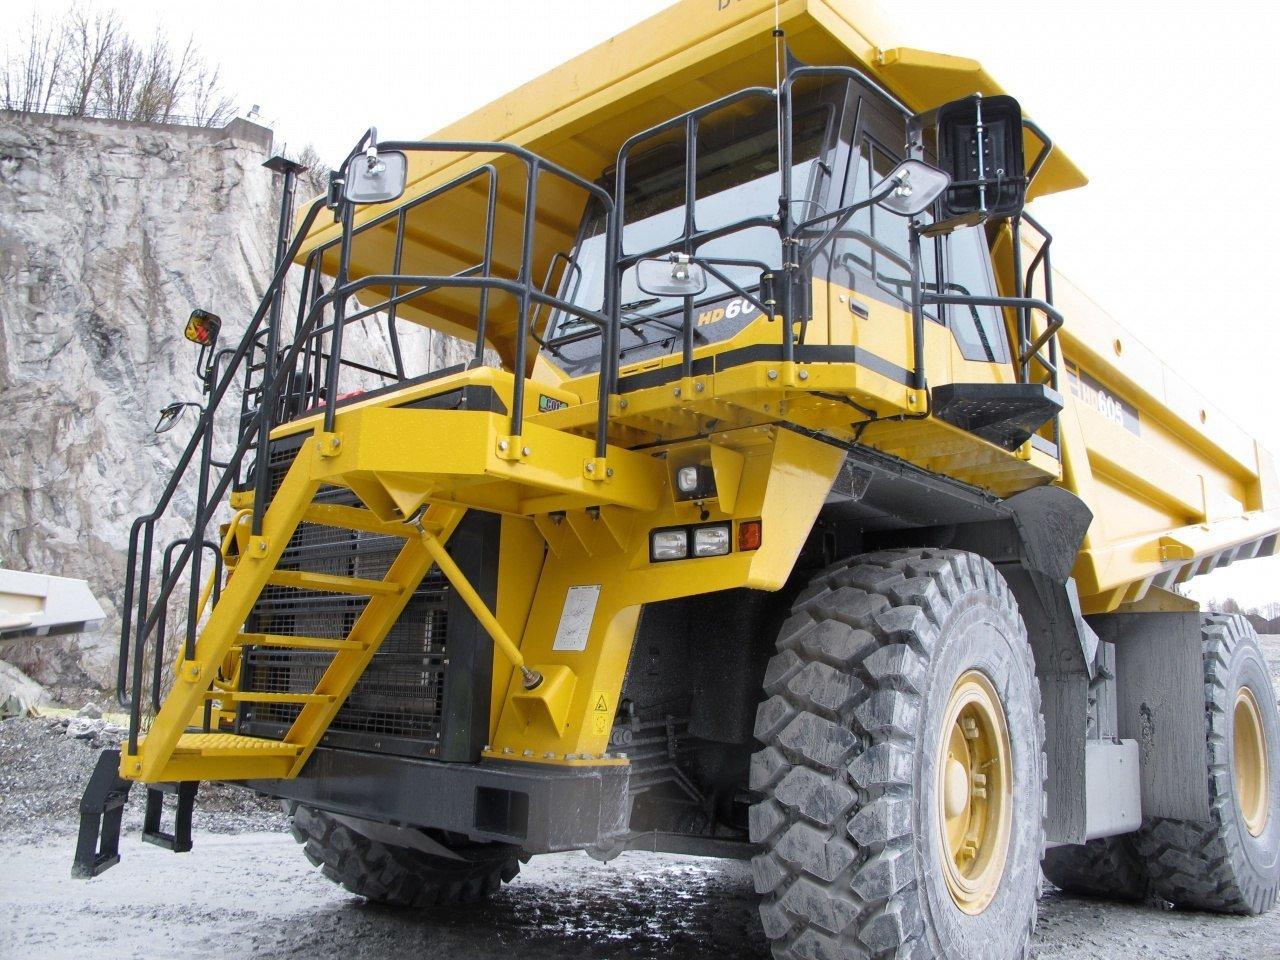 Создан самый тяжелый электрокар вмире весом в45 тонн